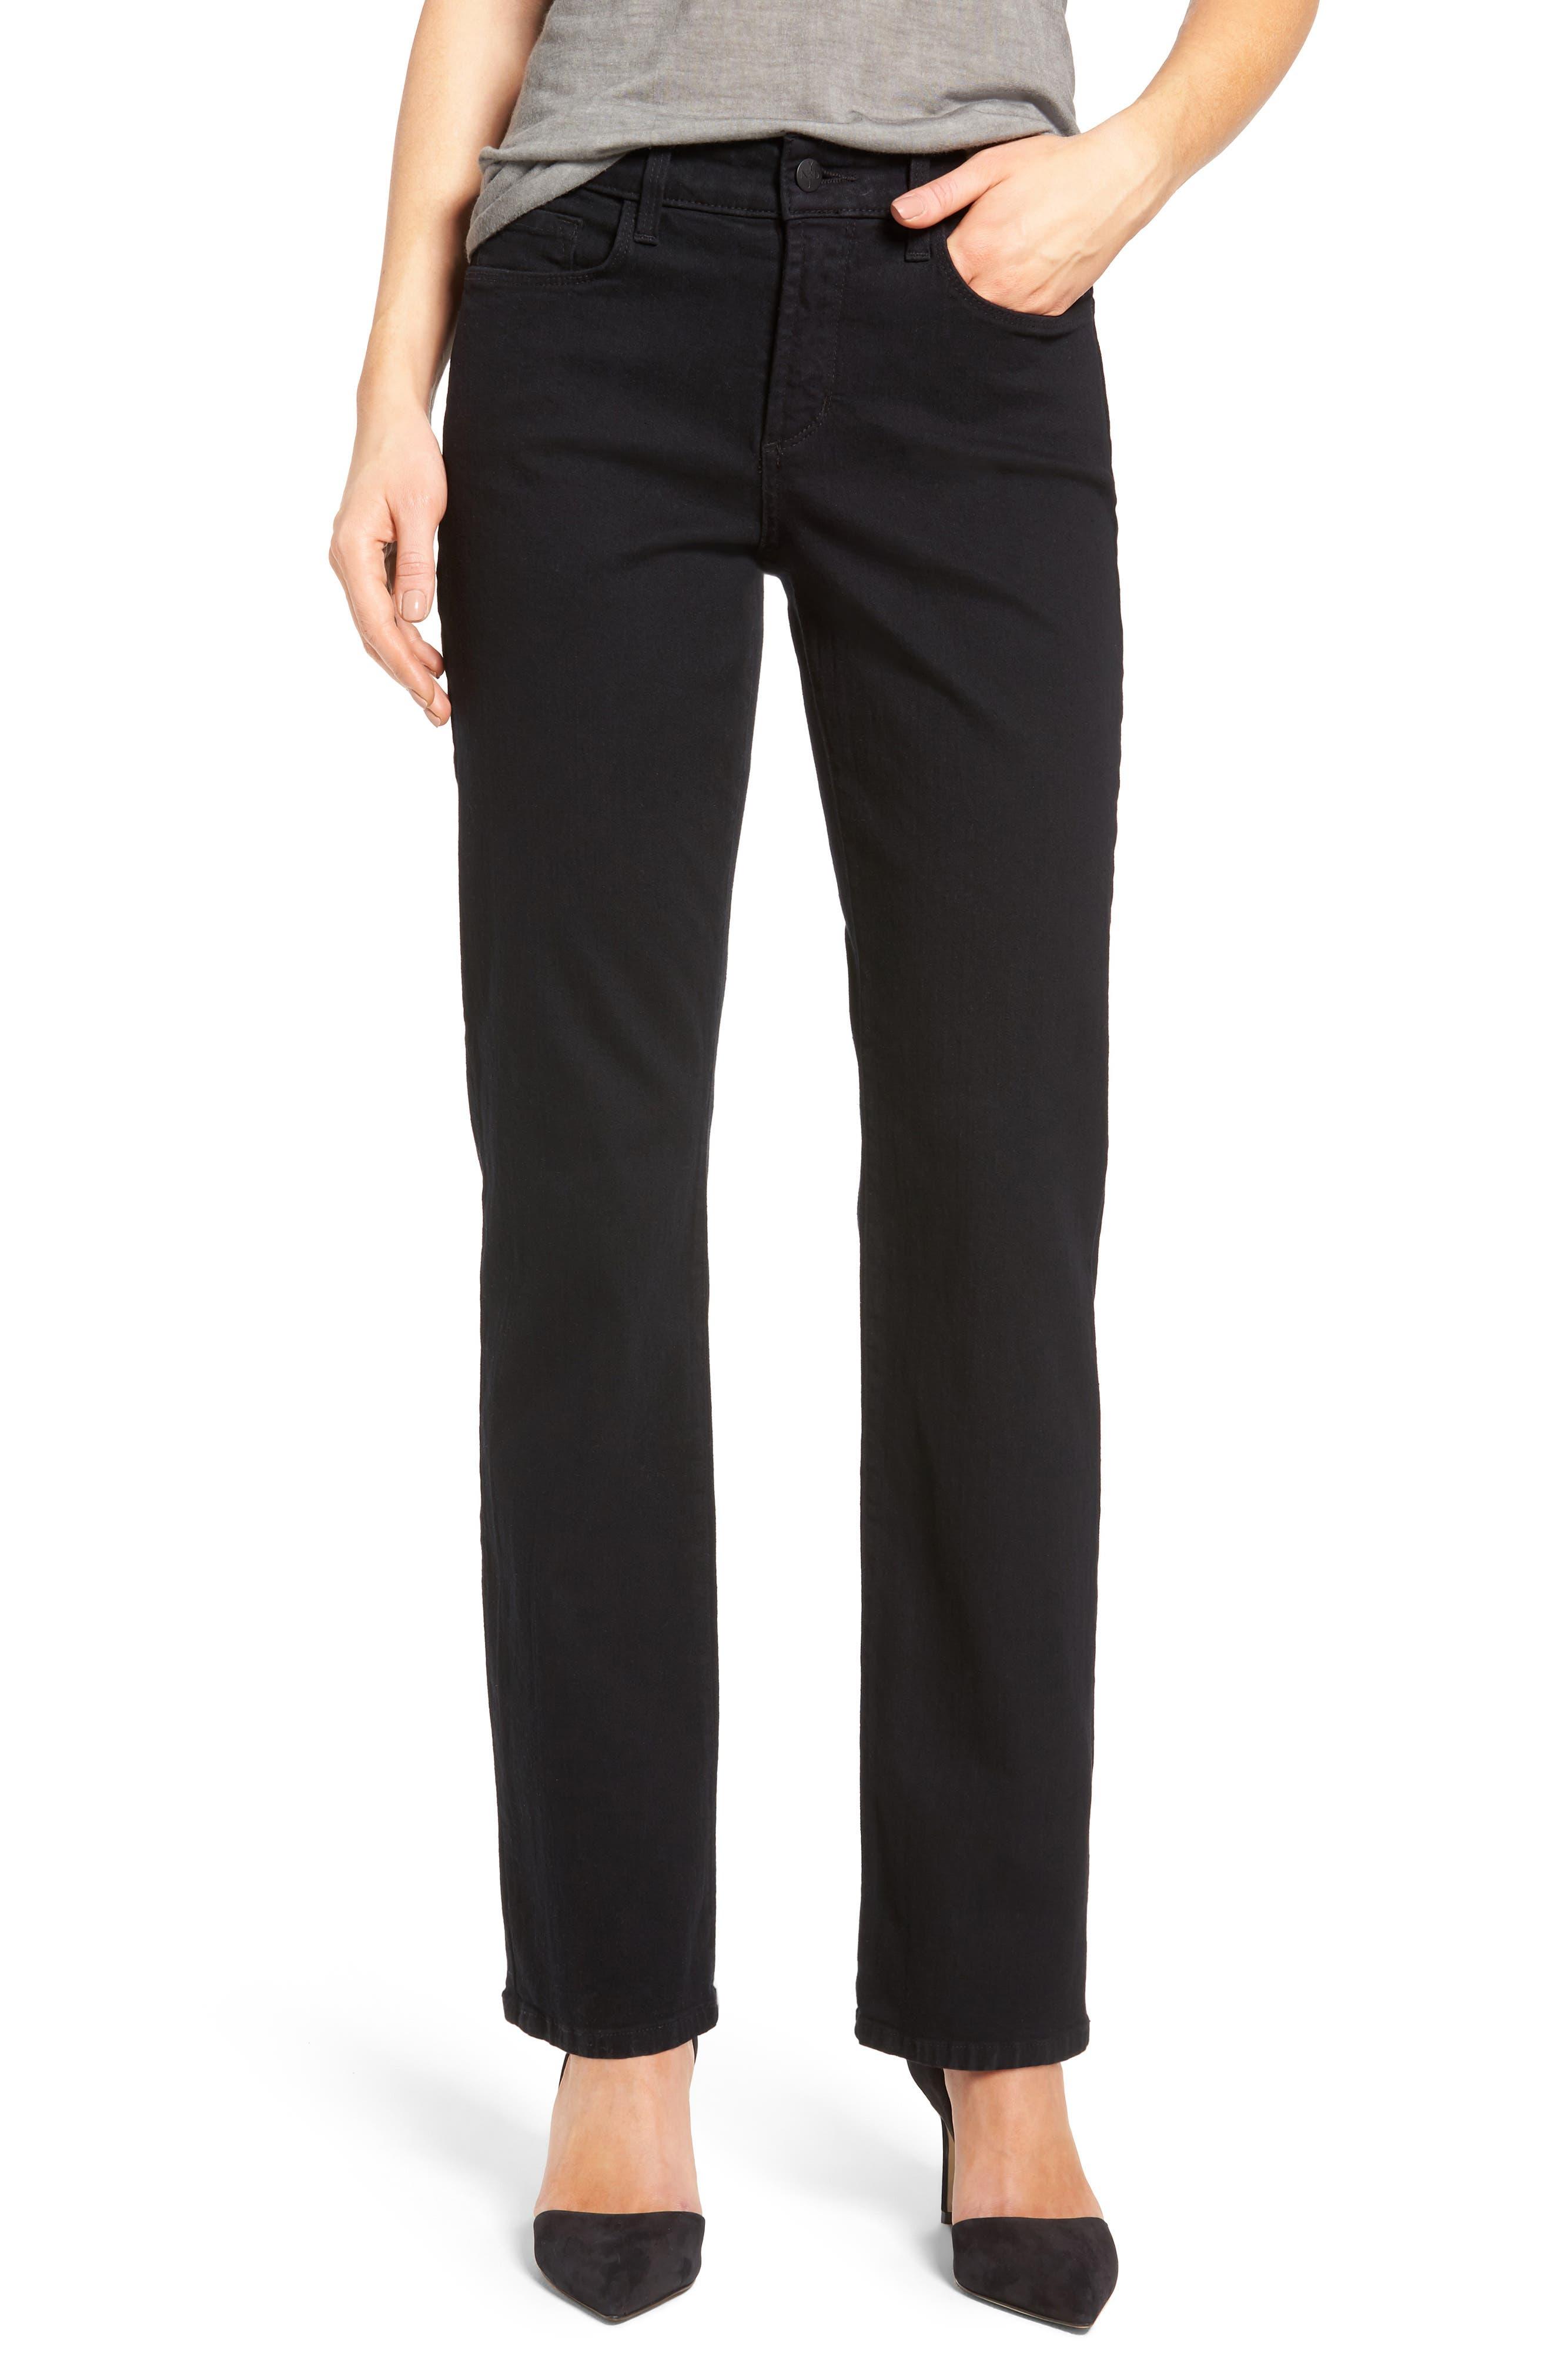 NYDJ,                             Marilyn High Waist Stretch Straight Leg Jeans,                             Main thumbnail 1, color,                             BLACK